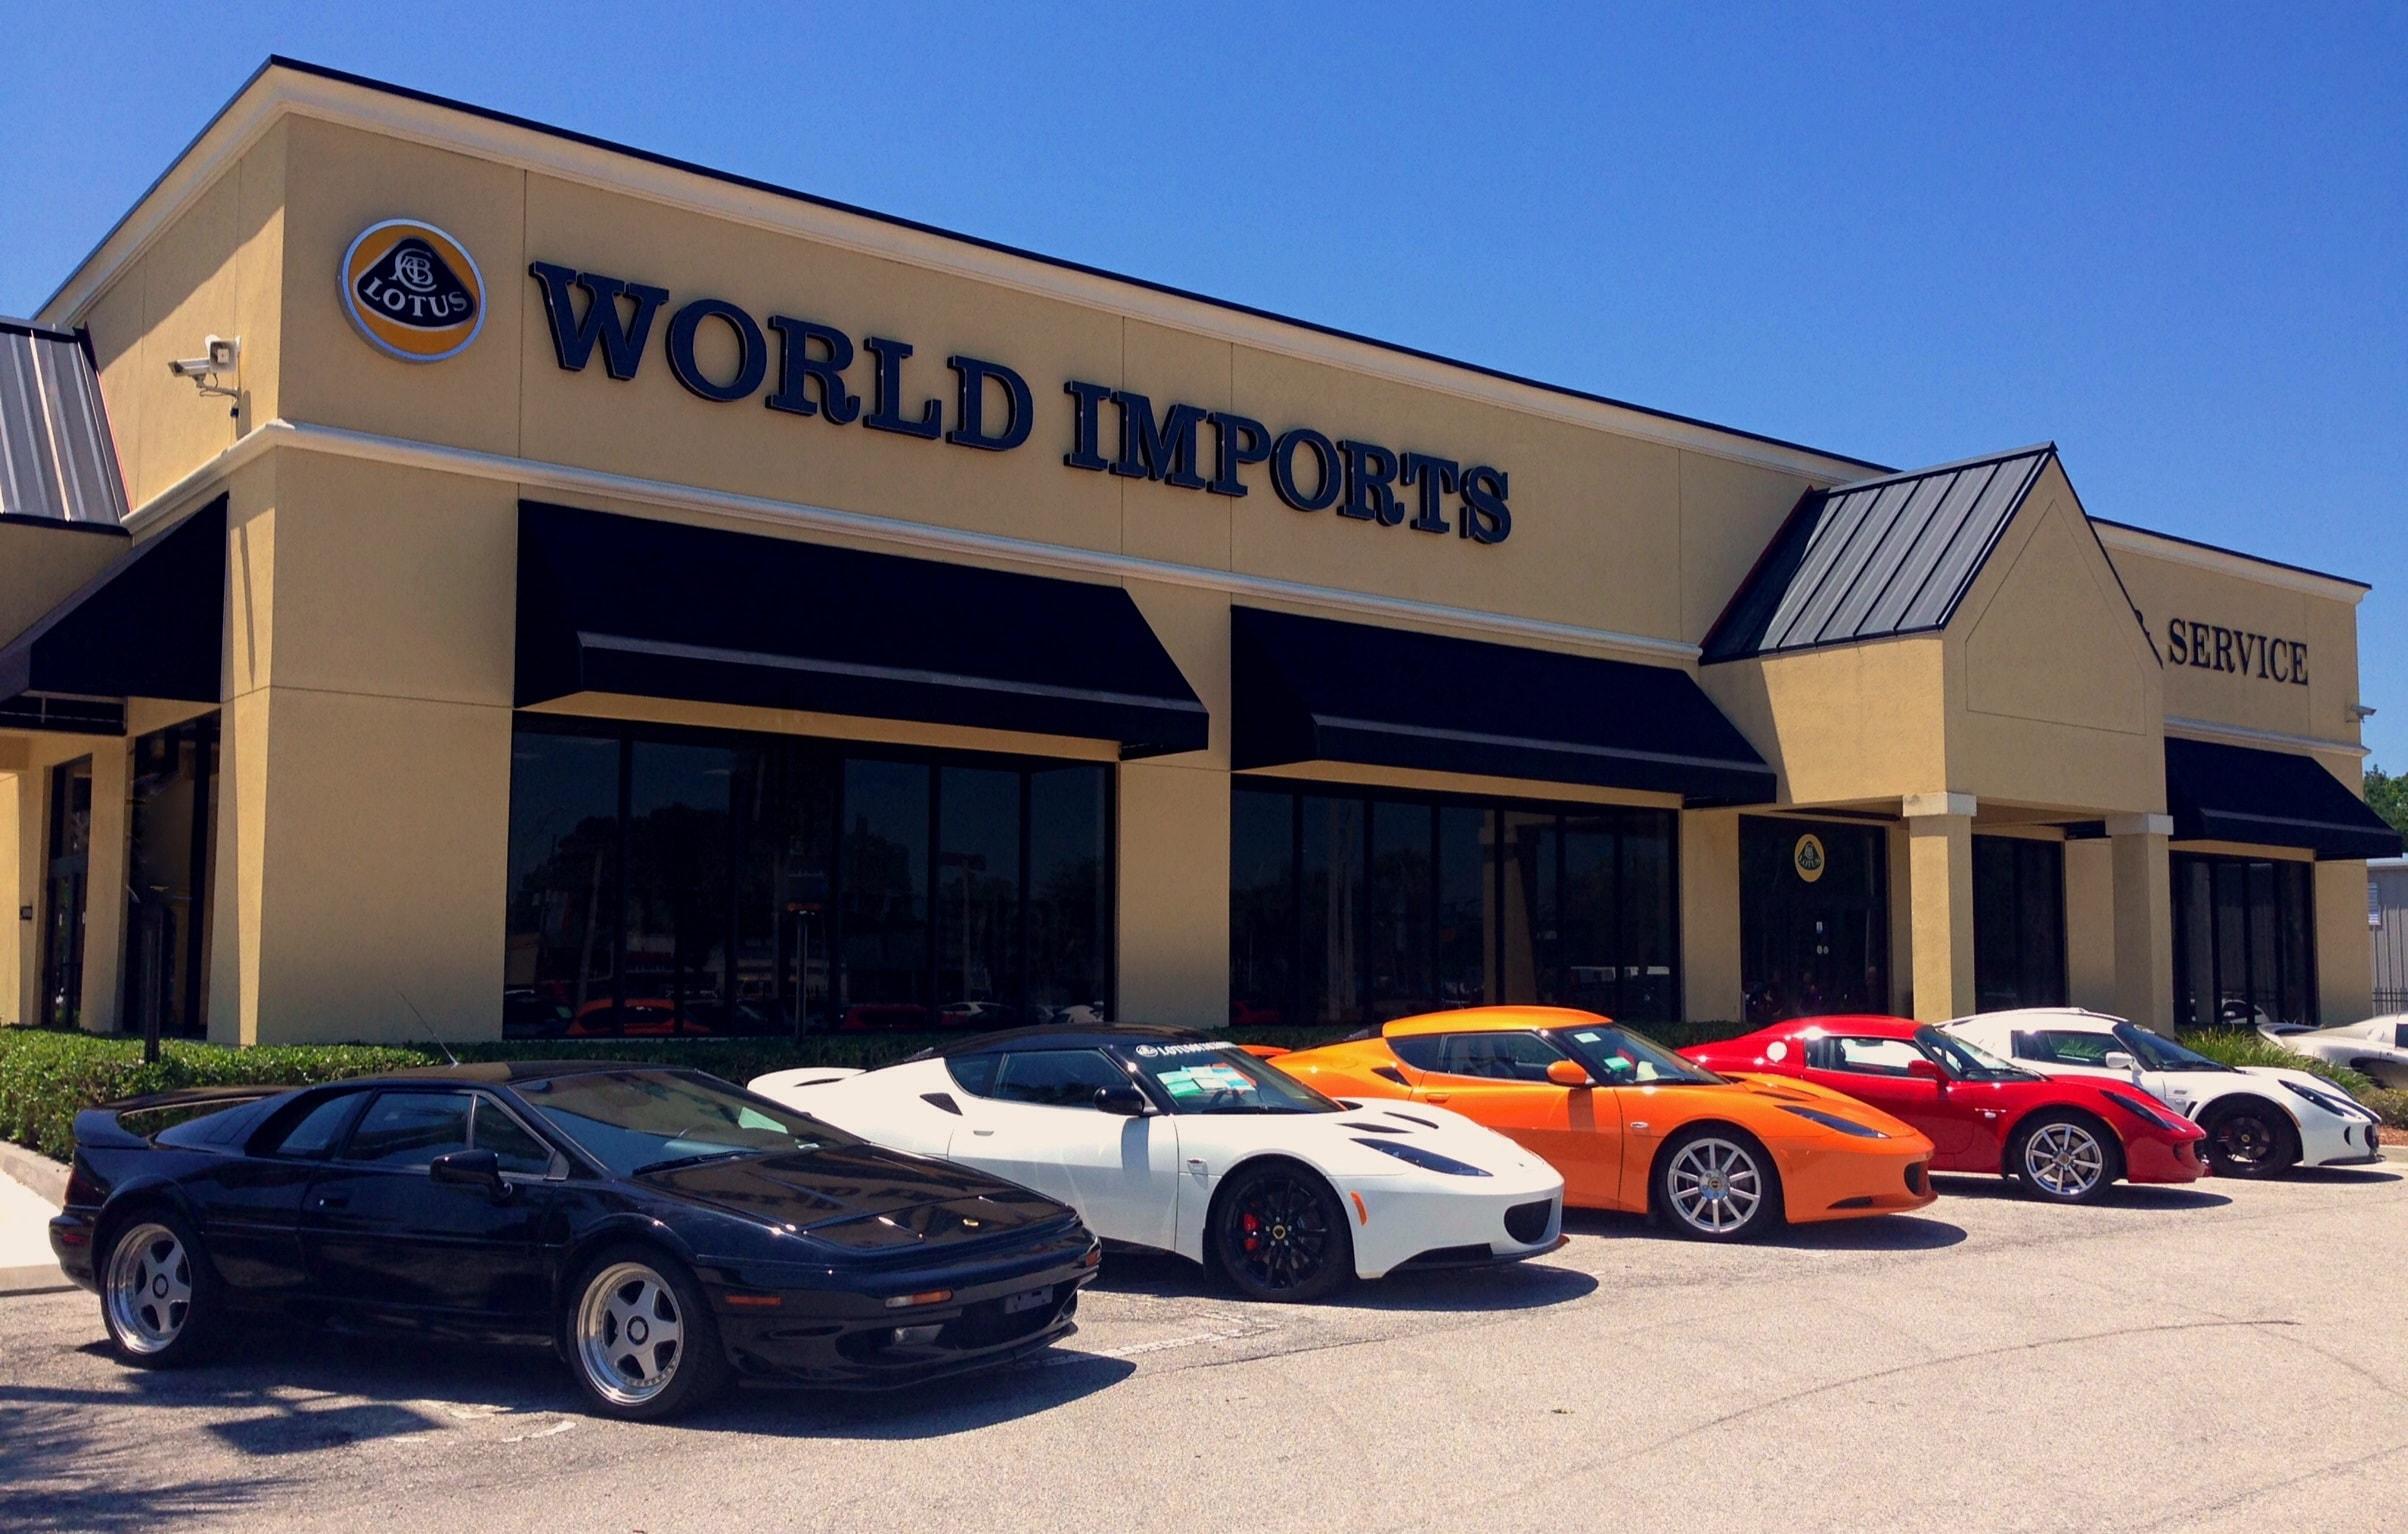 world imports usa new lotus dealership in jacksonville autos post. Black Bedroom Furniture Sets. Home Design Ideas